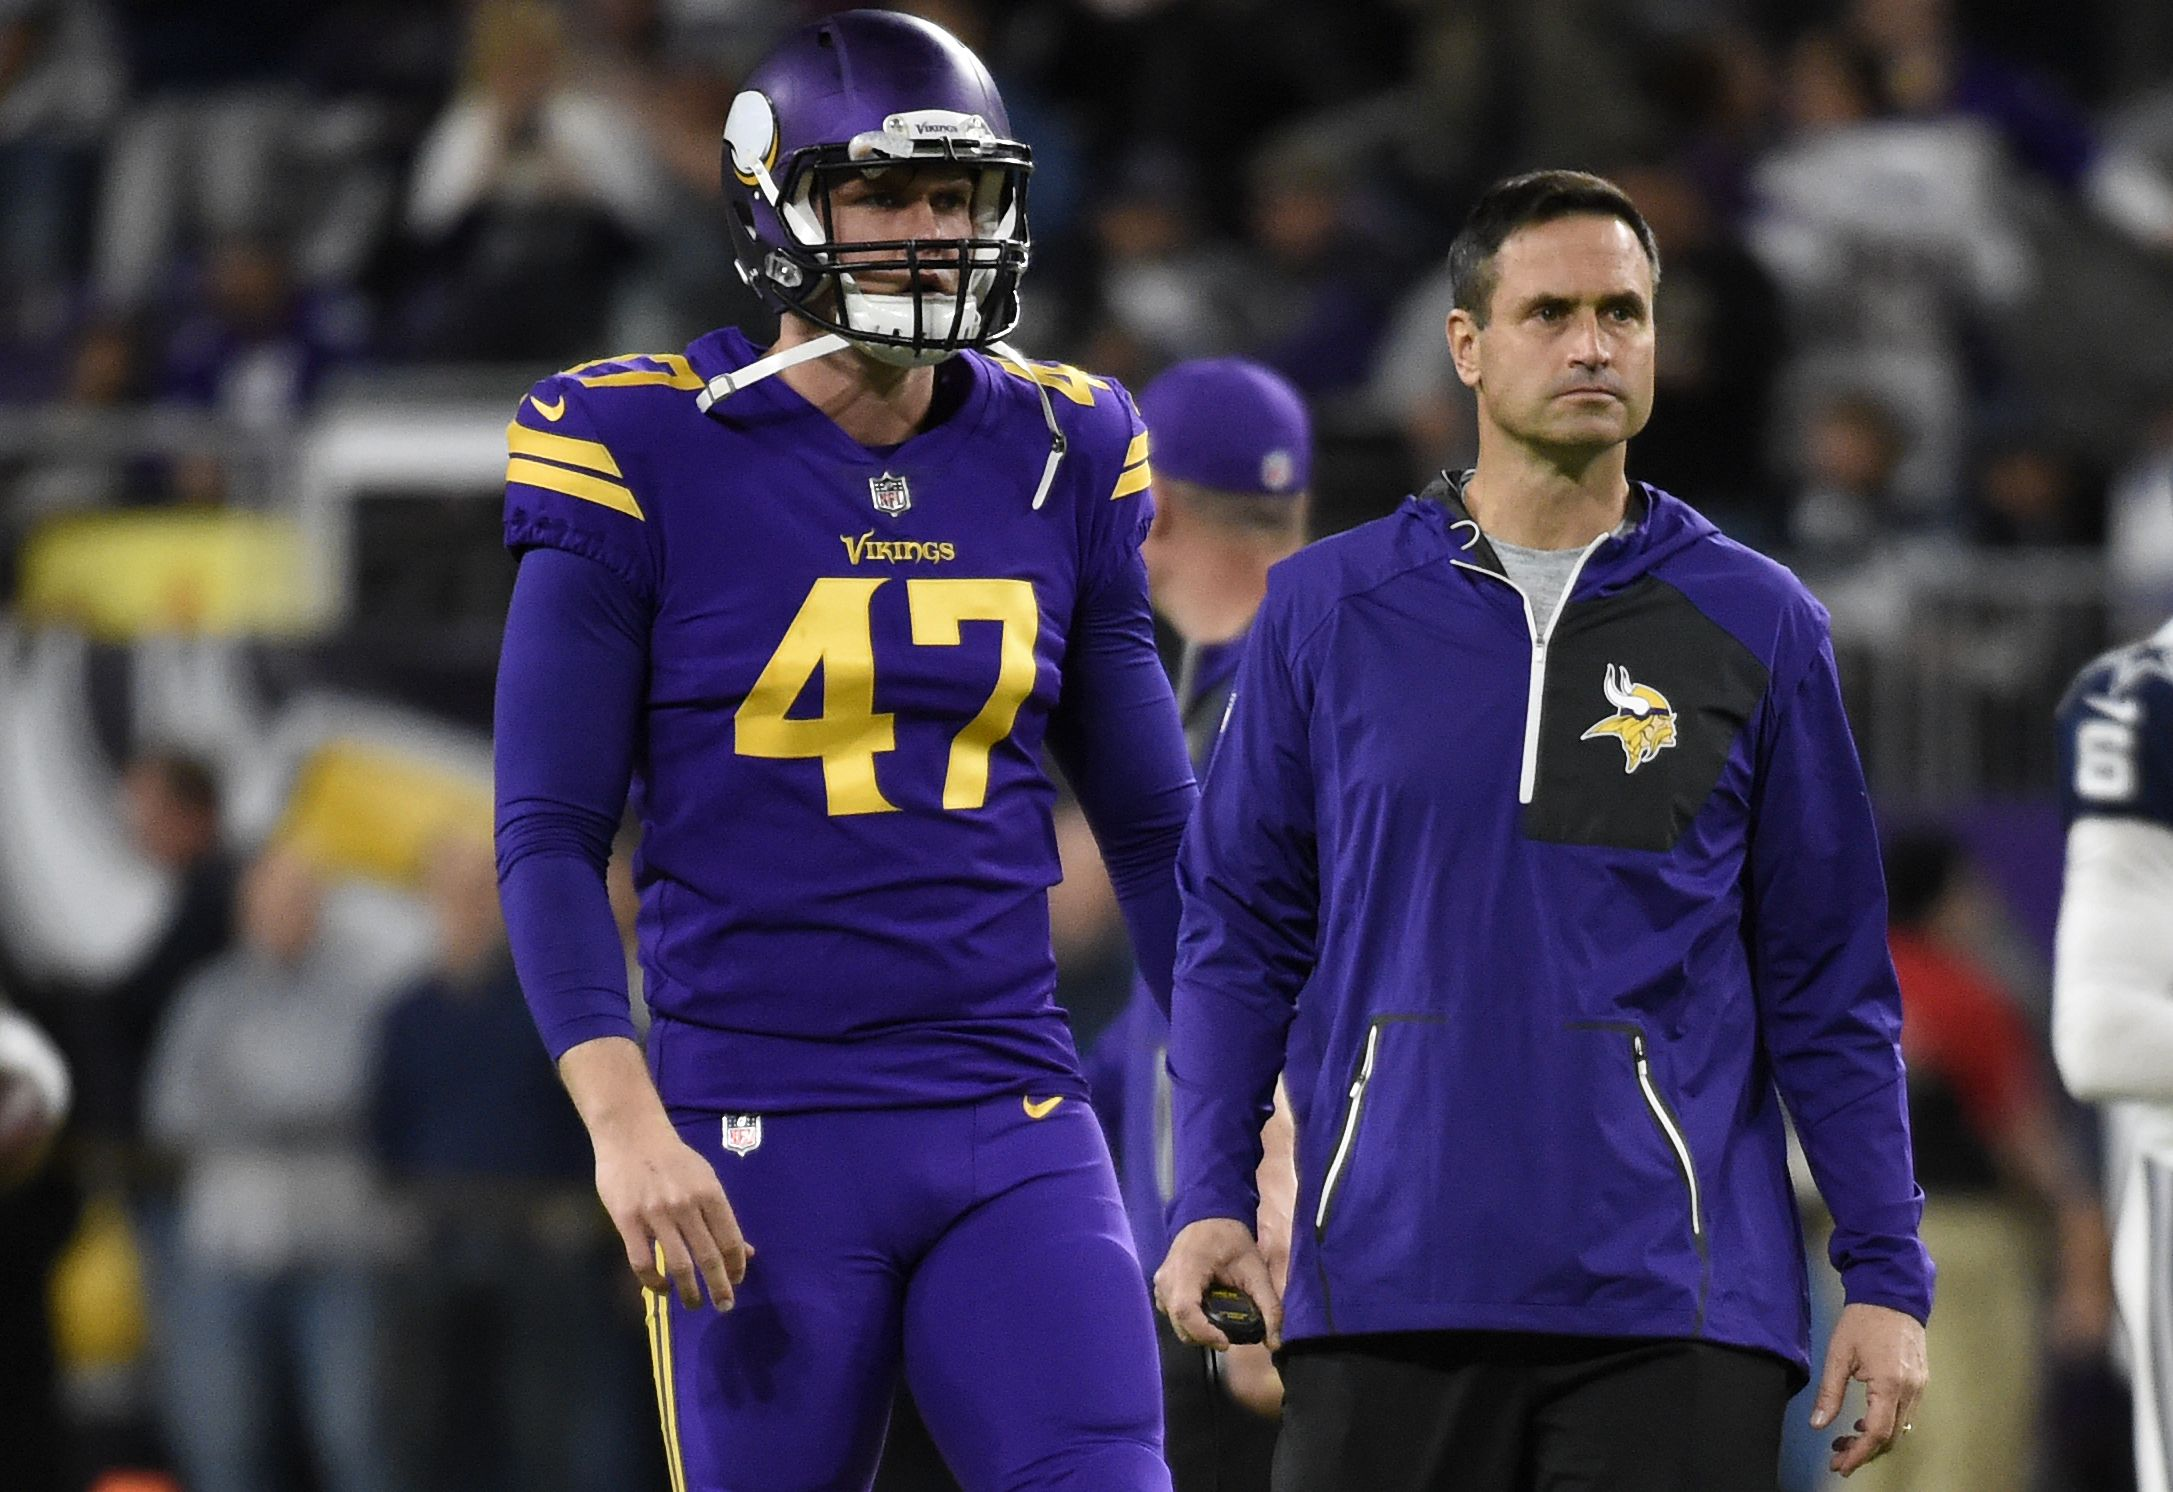 Vikings Long Snapper Mcdermott Loses Part Of A Finger